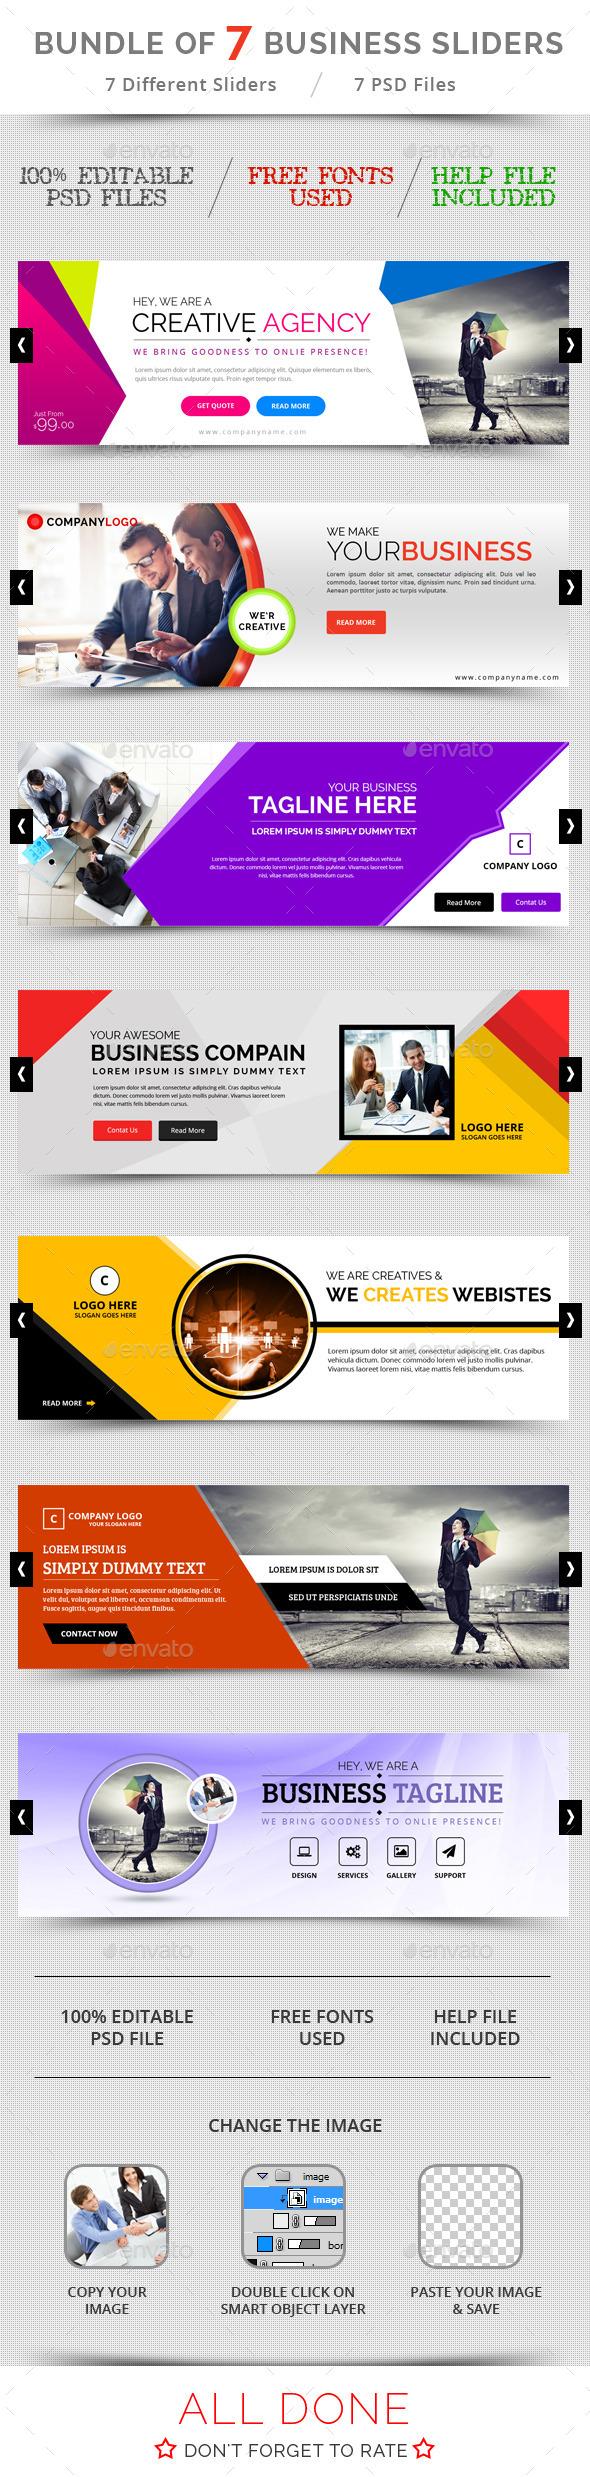 GraphicRiver Bundle of 7 Business Sliders 10665754